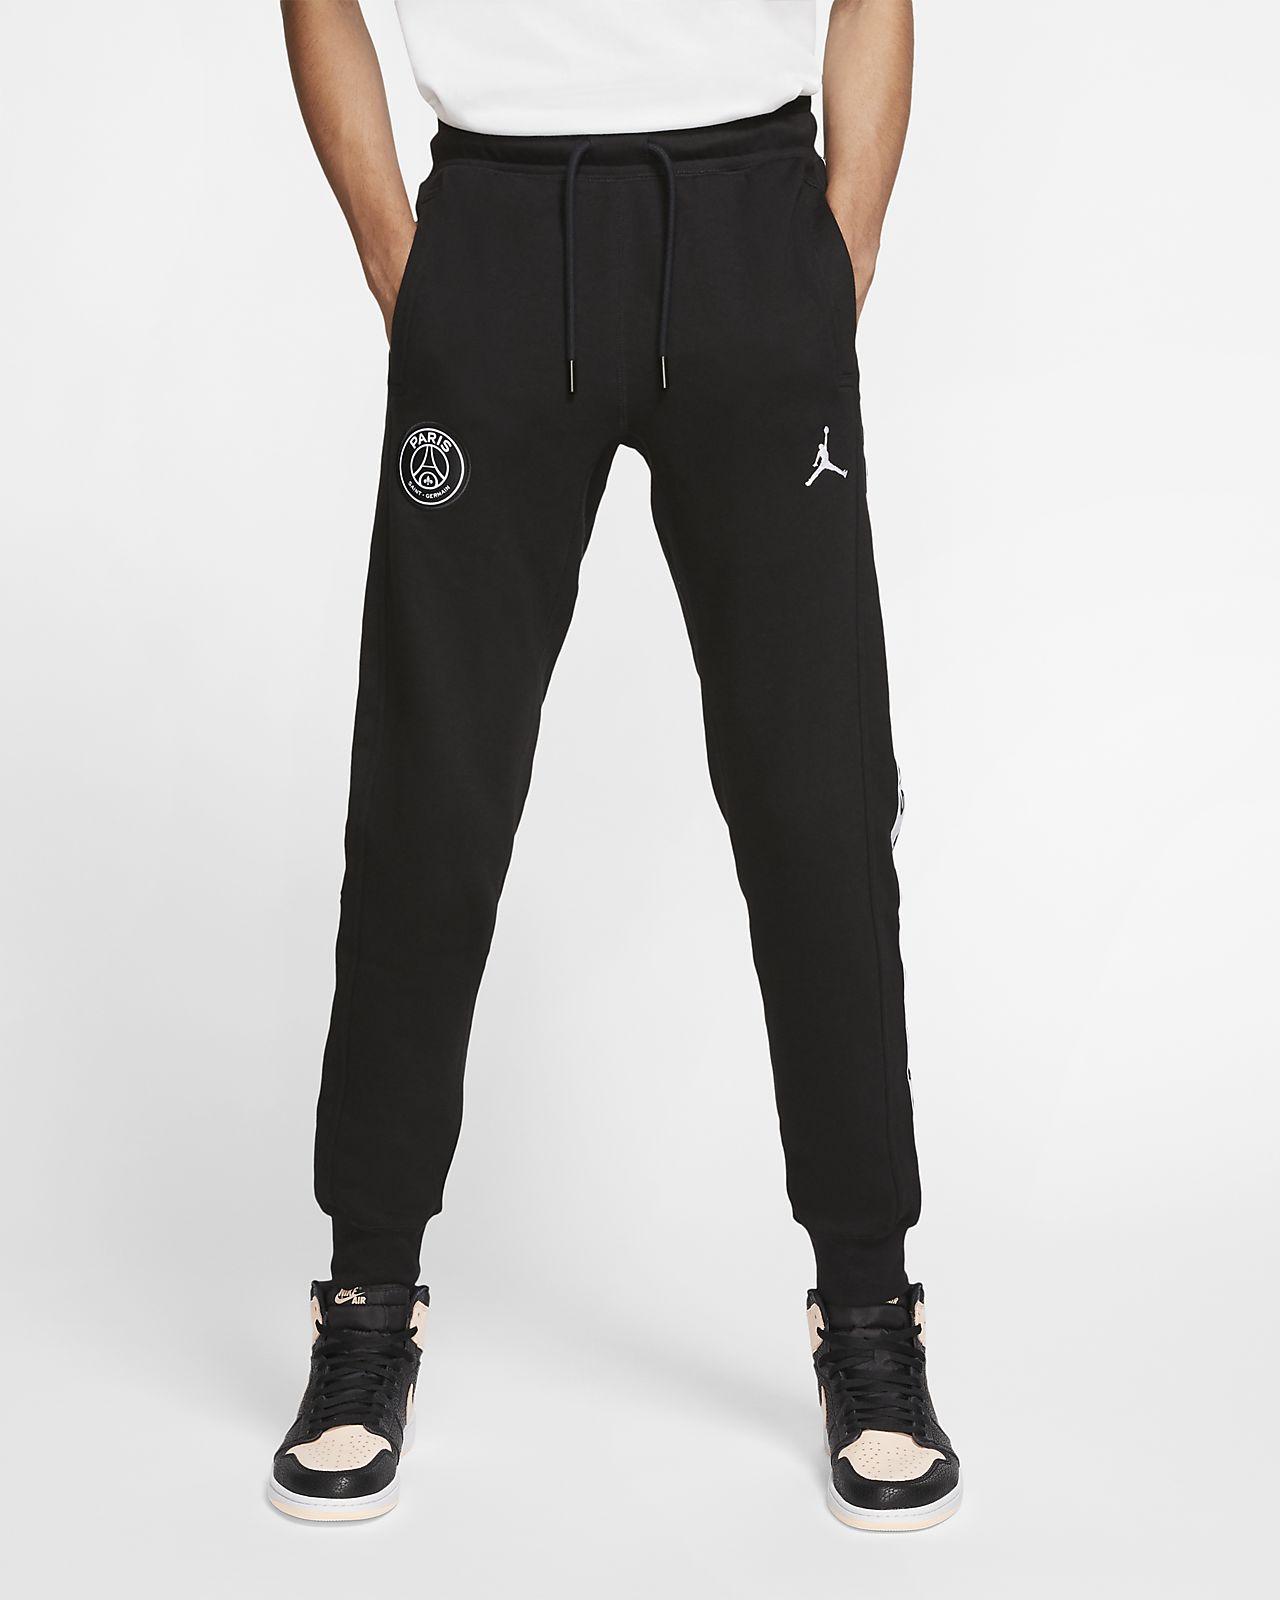 Paris Saint-Germain 男款 Fleece 運動褲